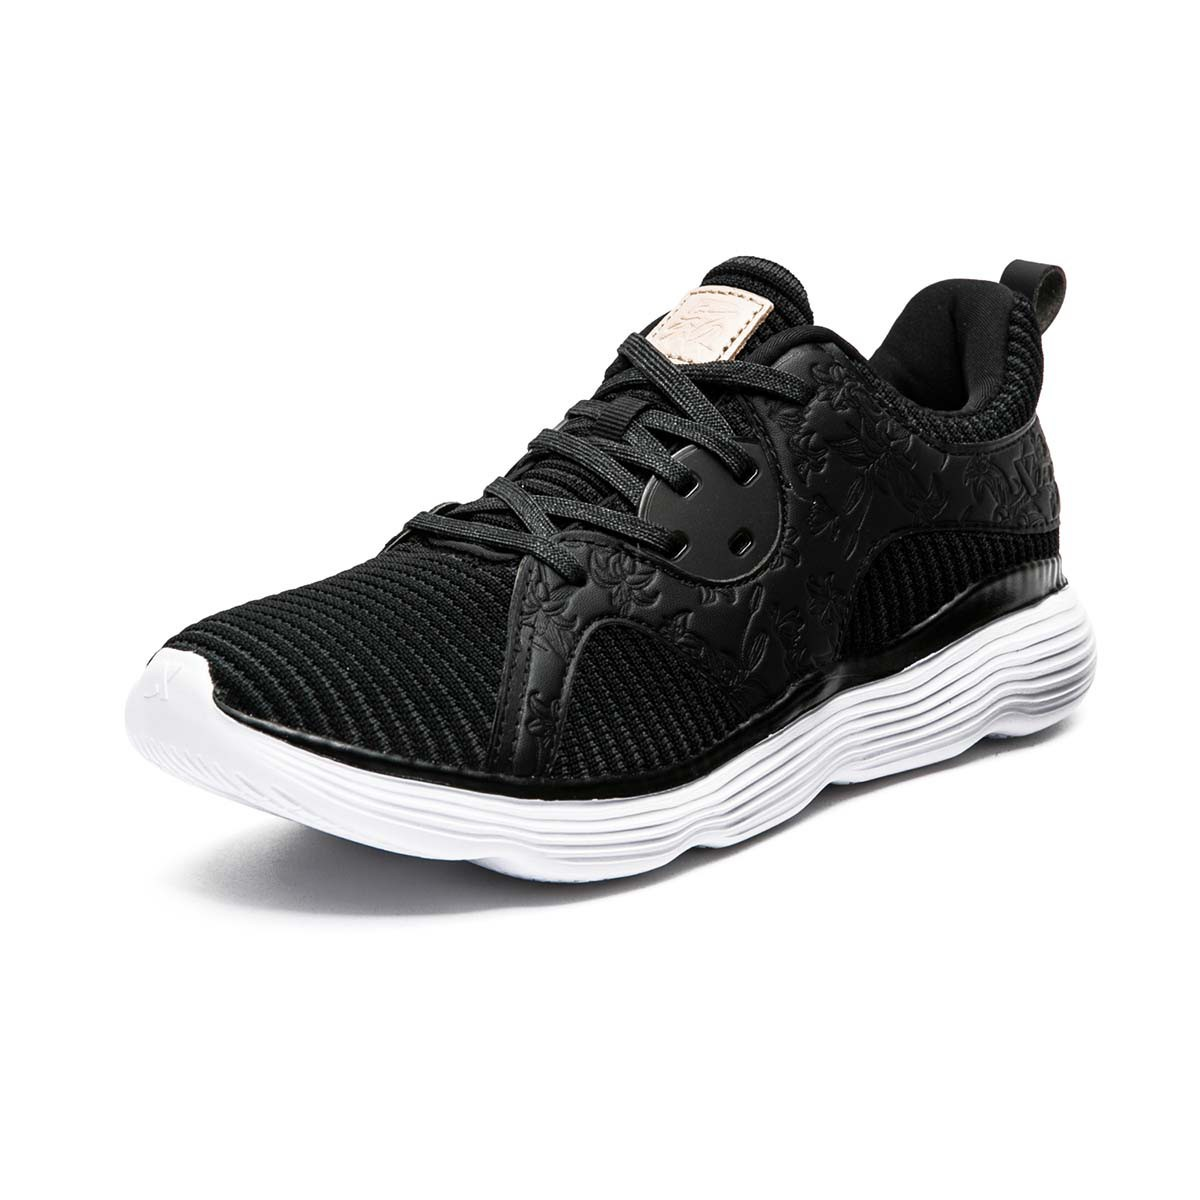 XTEP 特步 女士训练鞋 982318520680 黑米 35